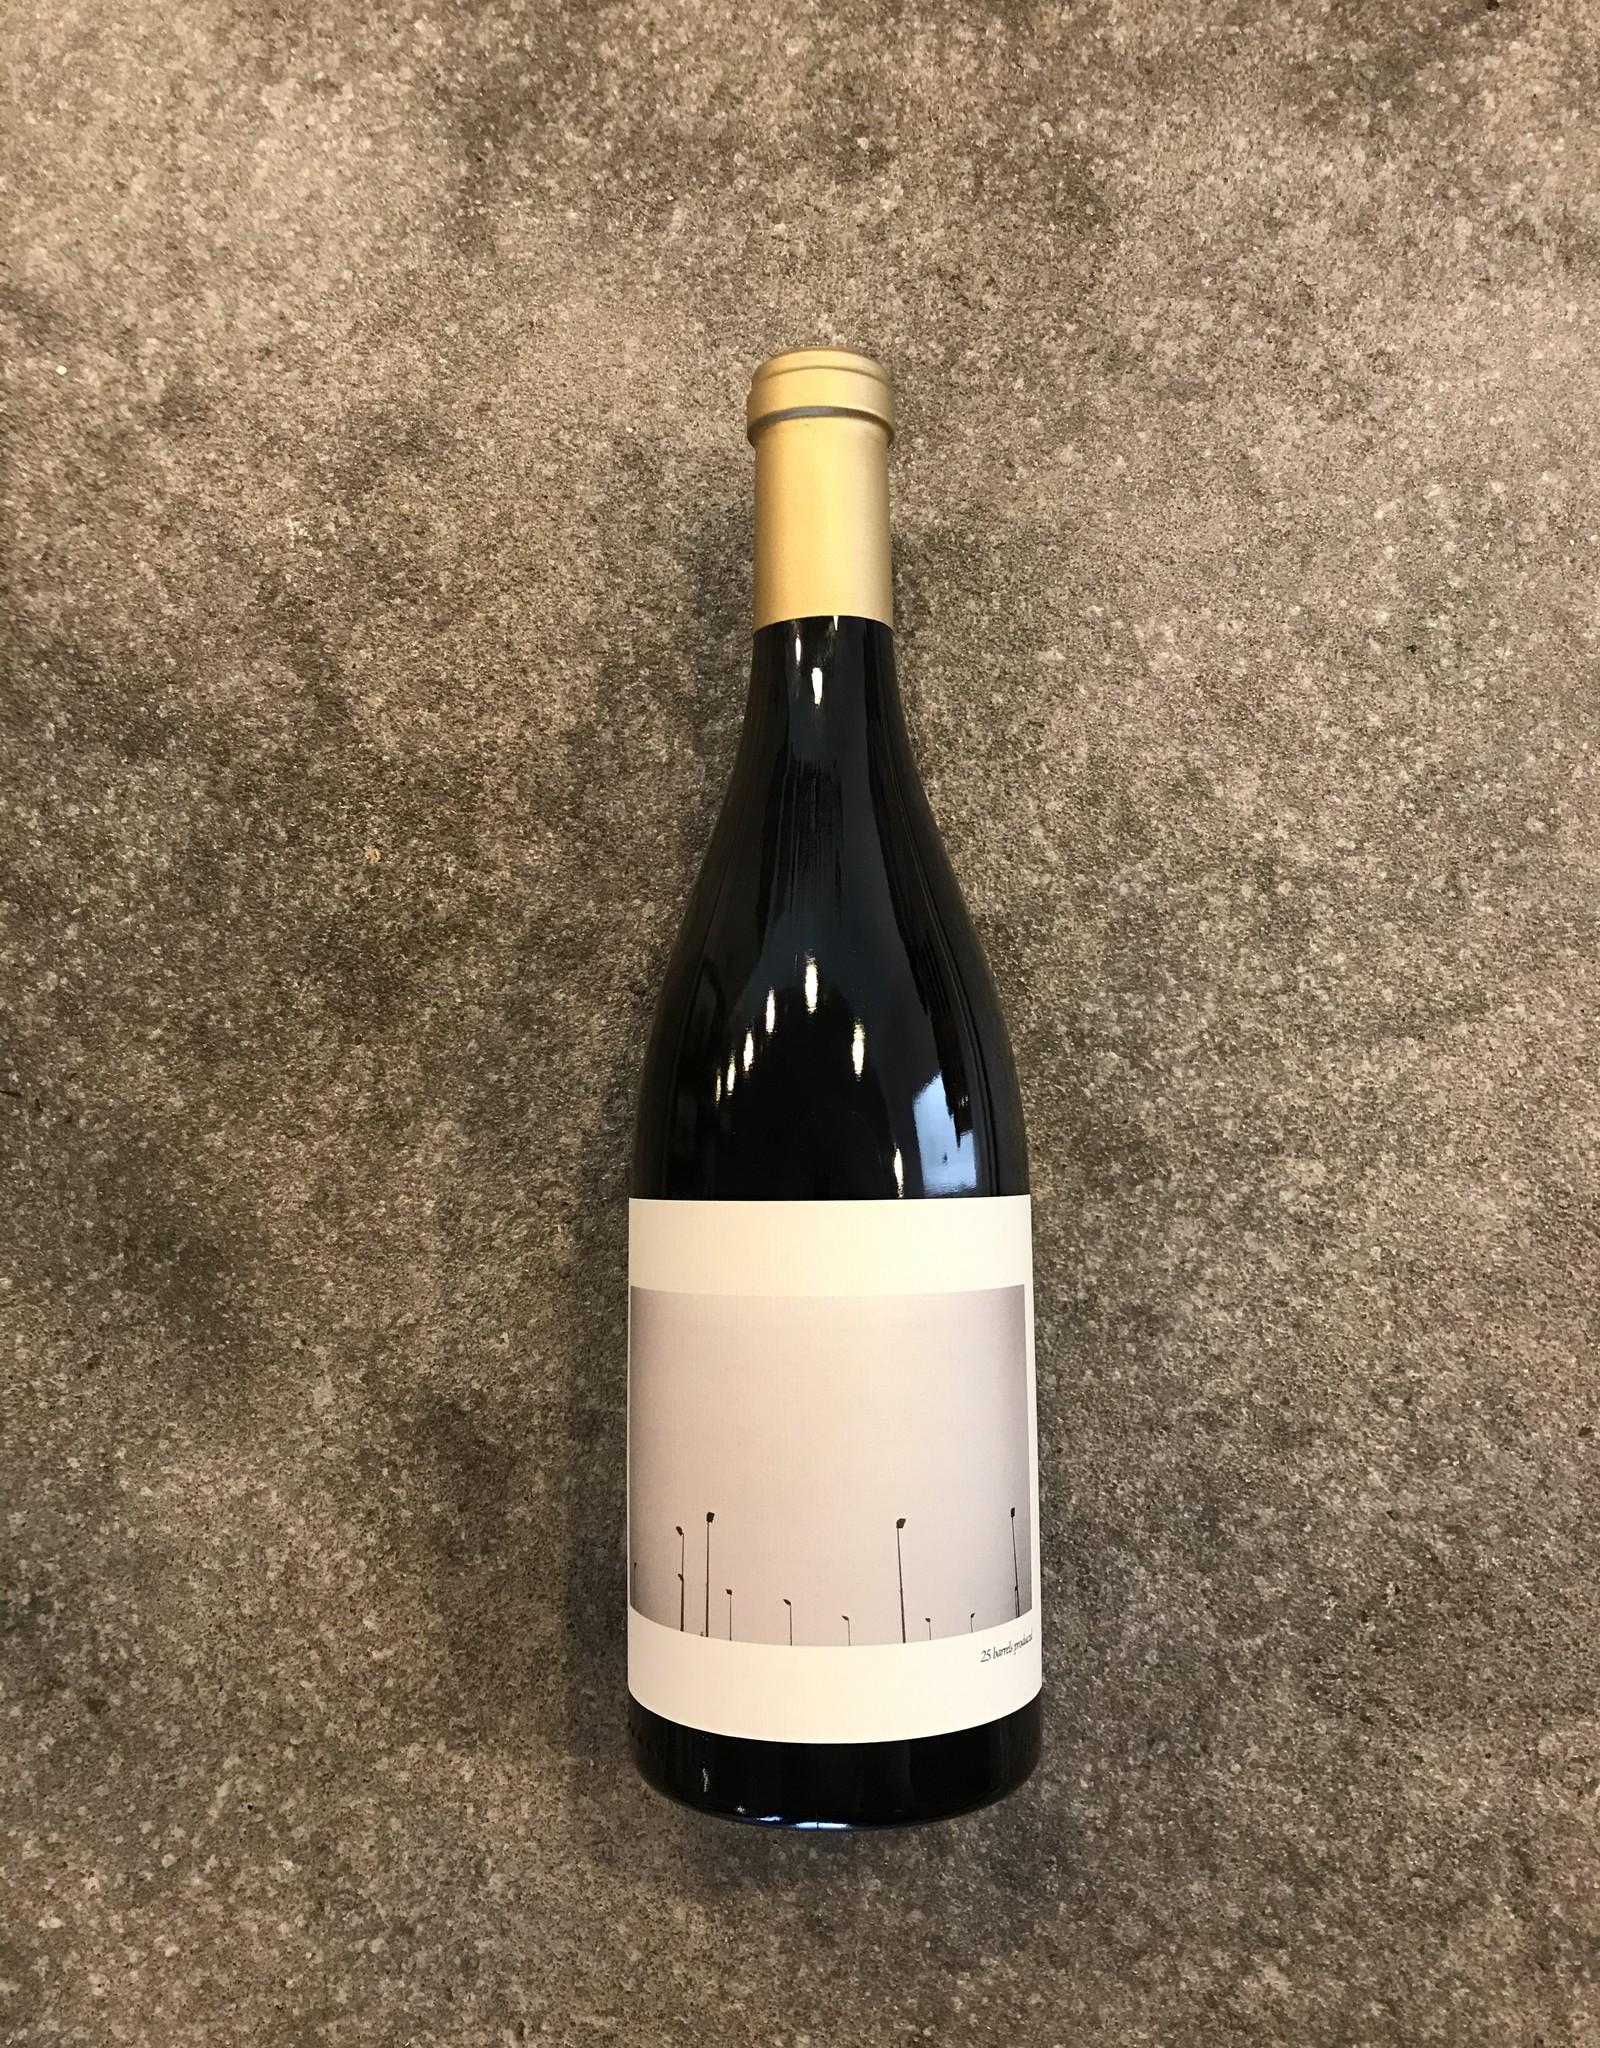 Chanin Los Alamos Vinyard Chardonnay 2017